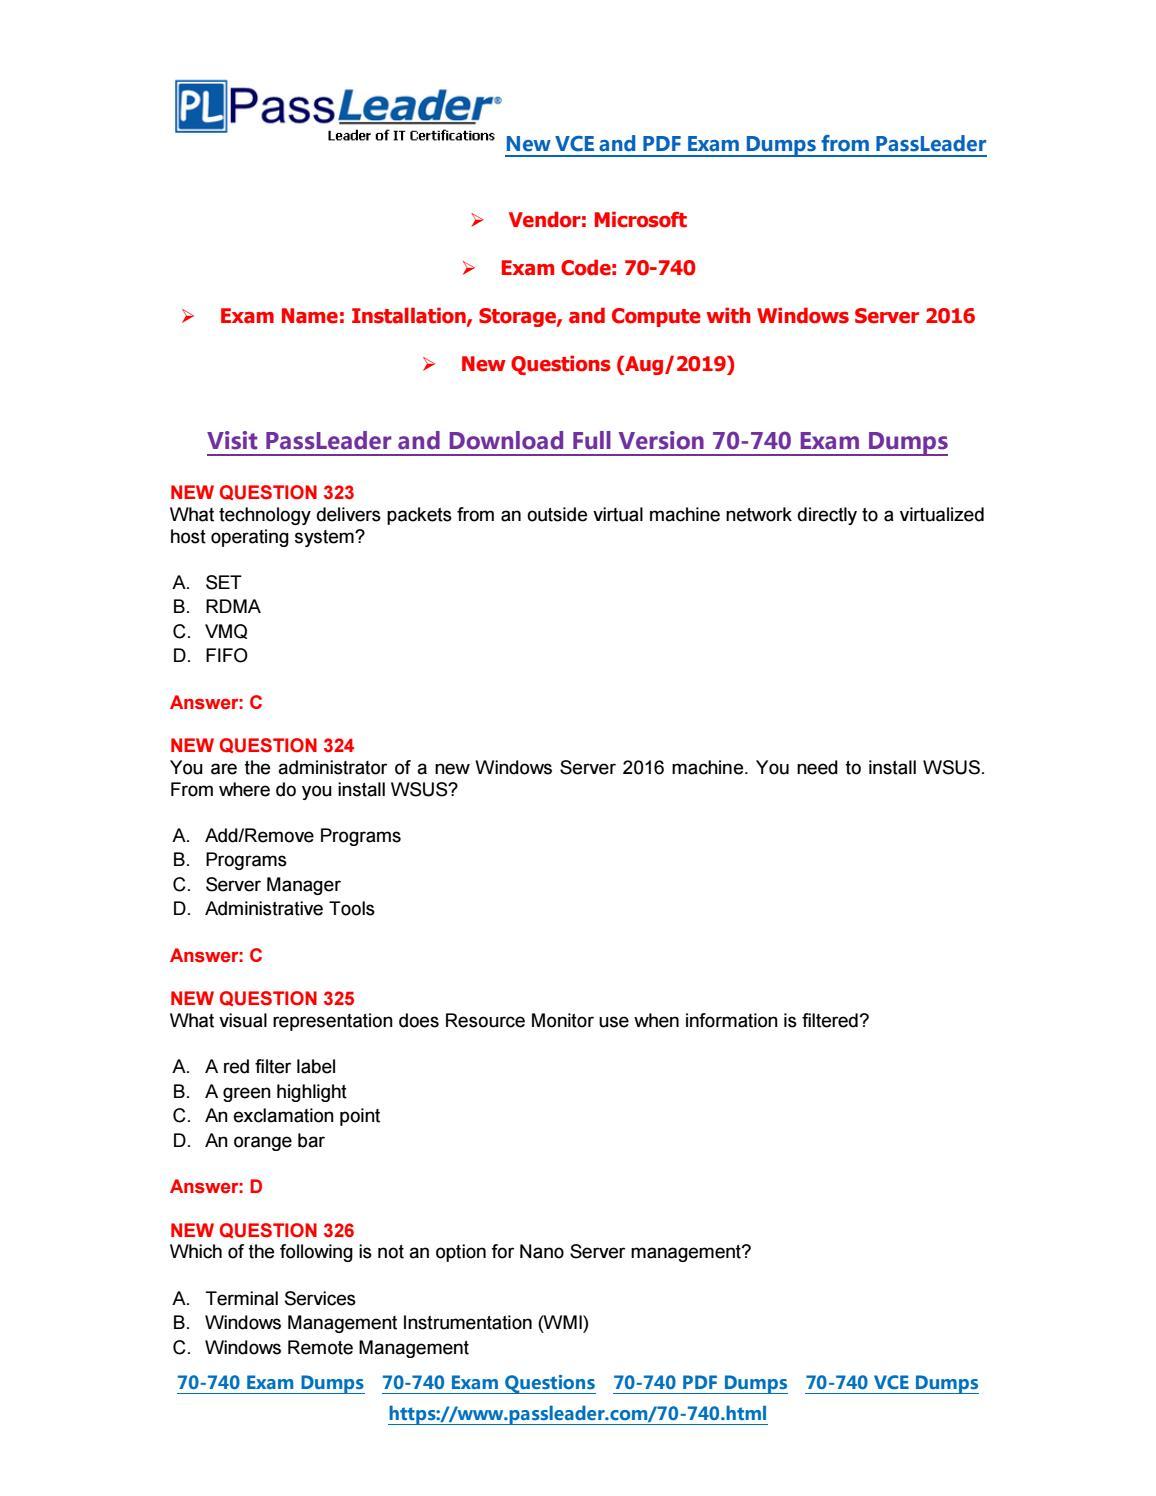 Updated 70-740 Exam 331 Q/&A PDF